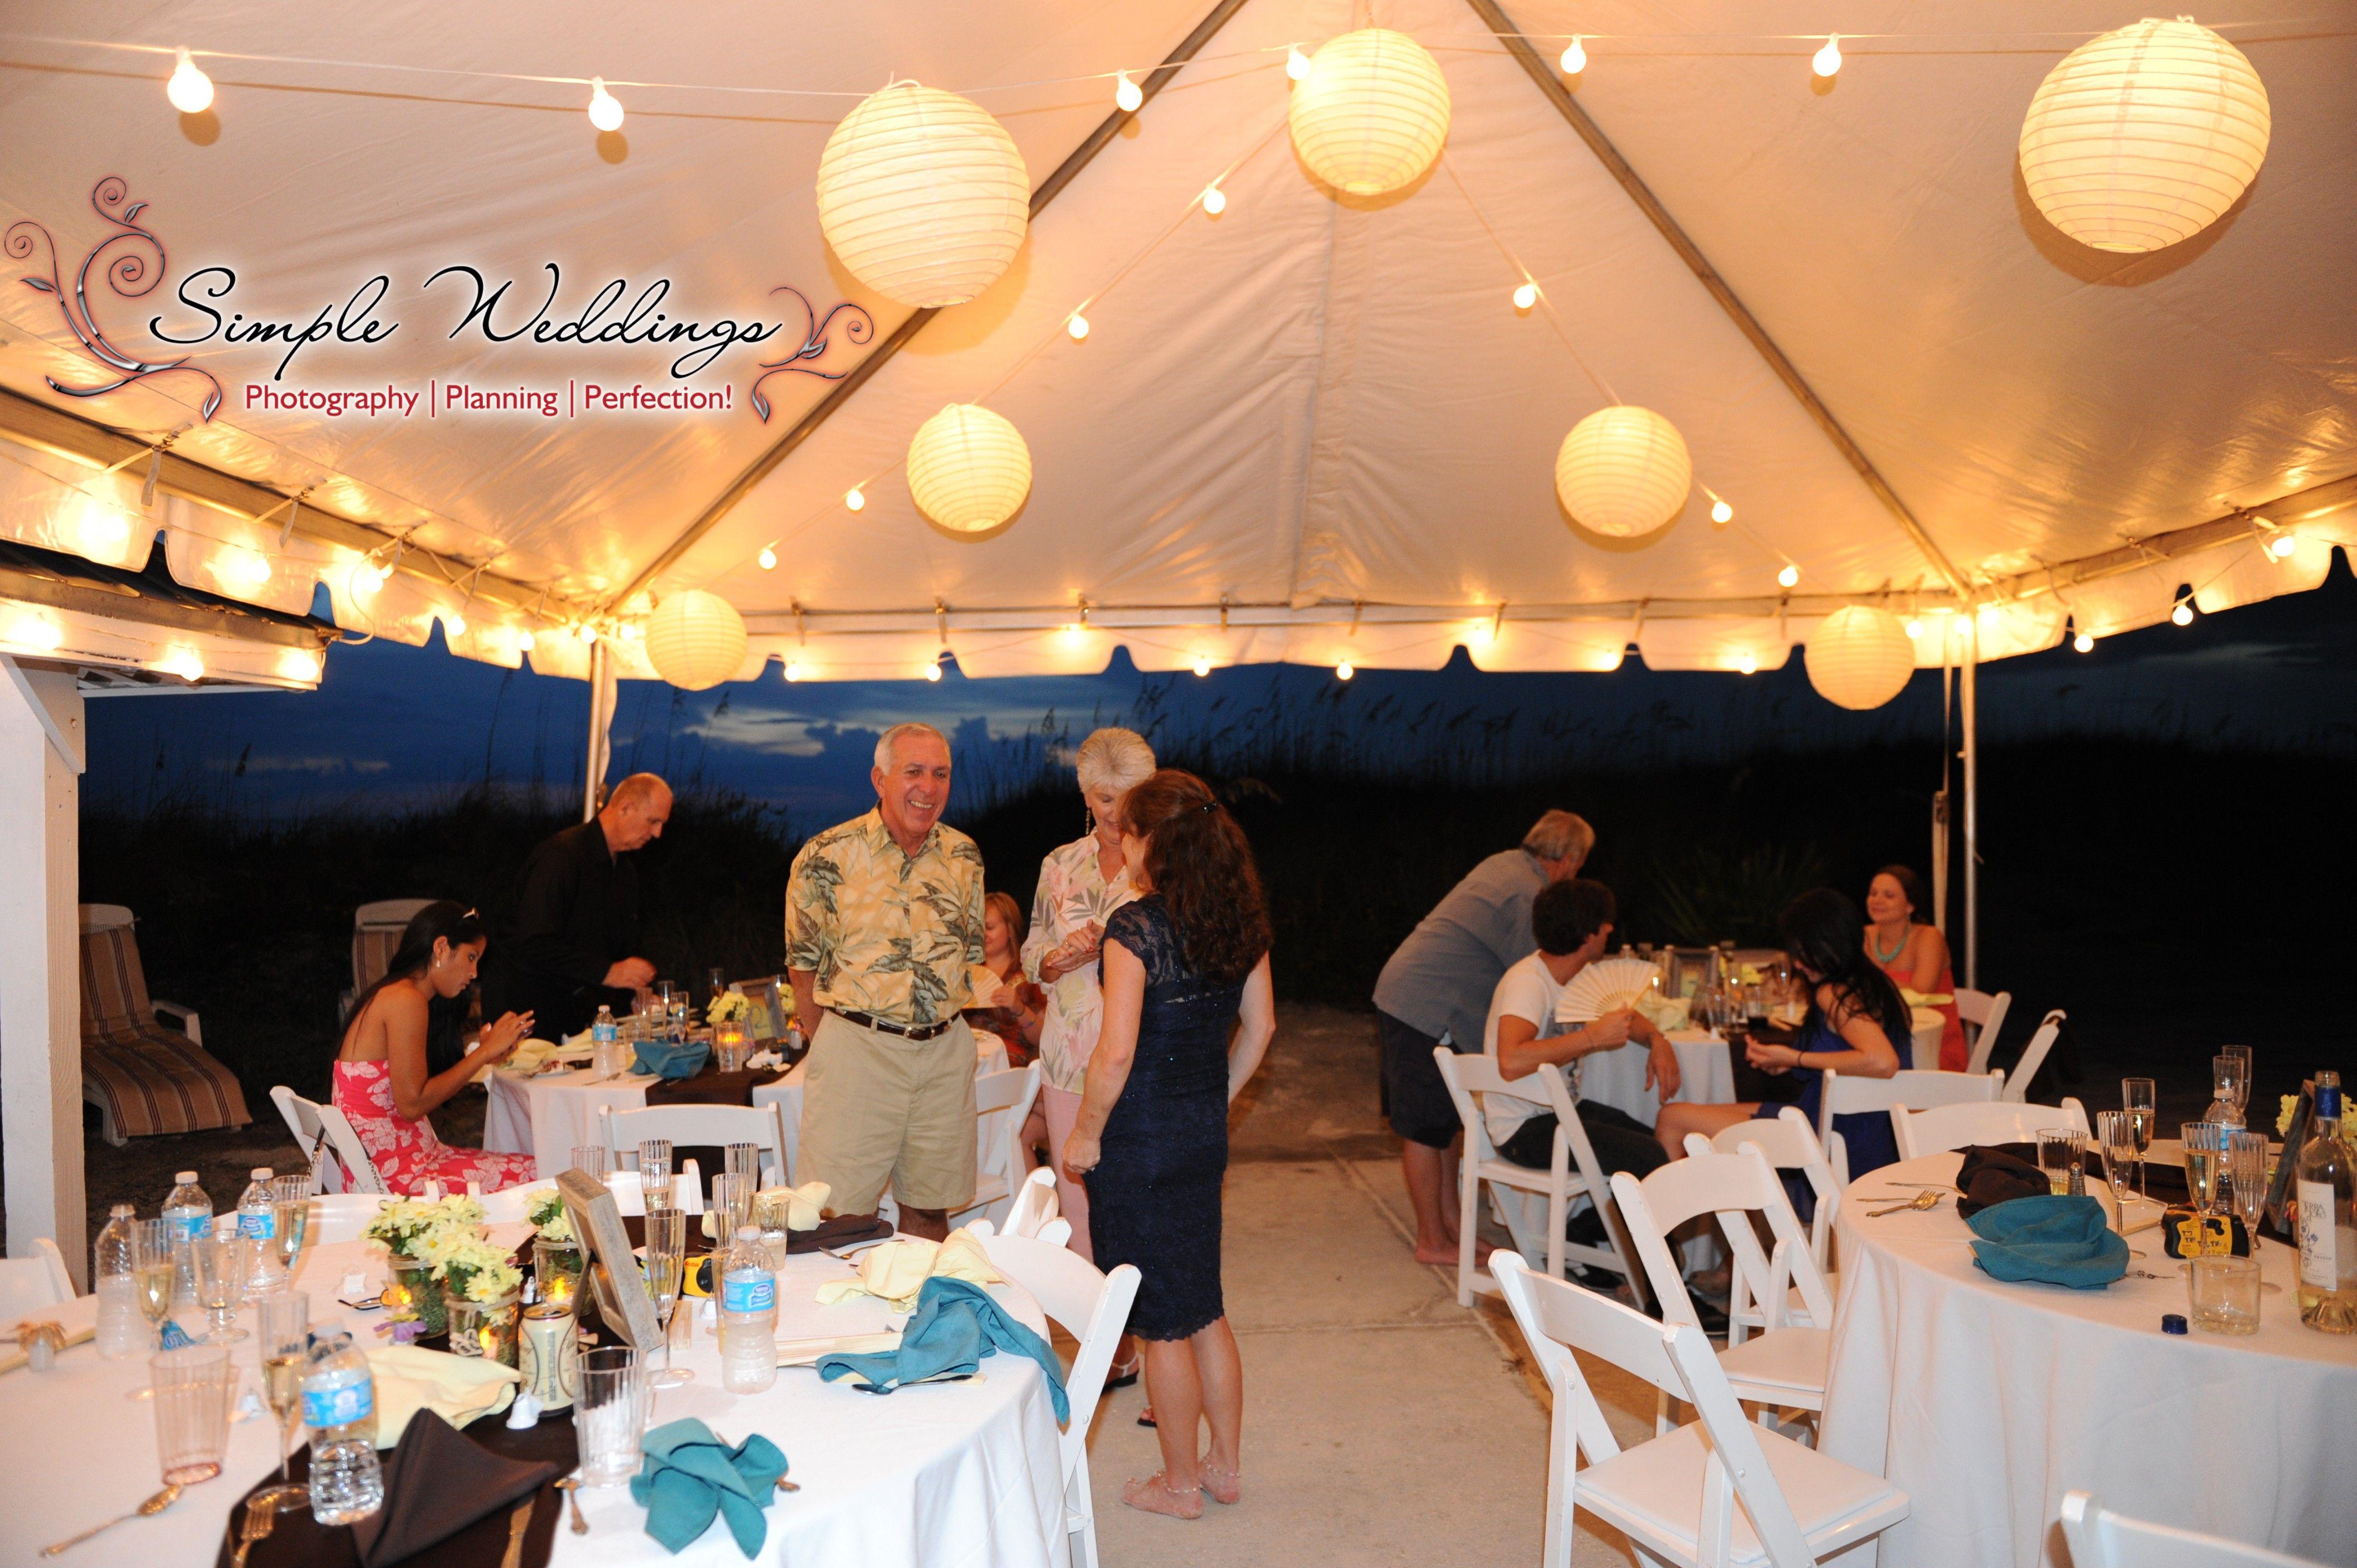 Tented Evening Beach Wedding Reception At The Serendipity Beach